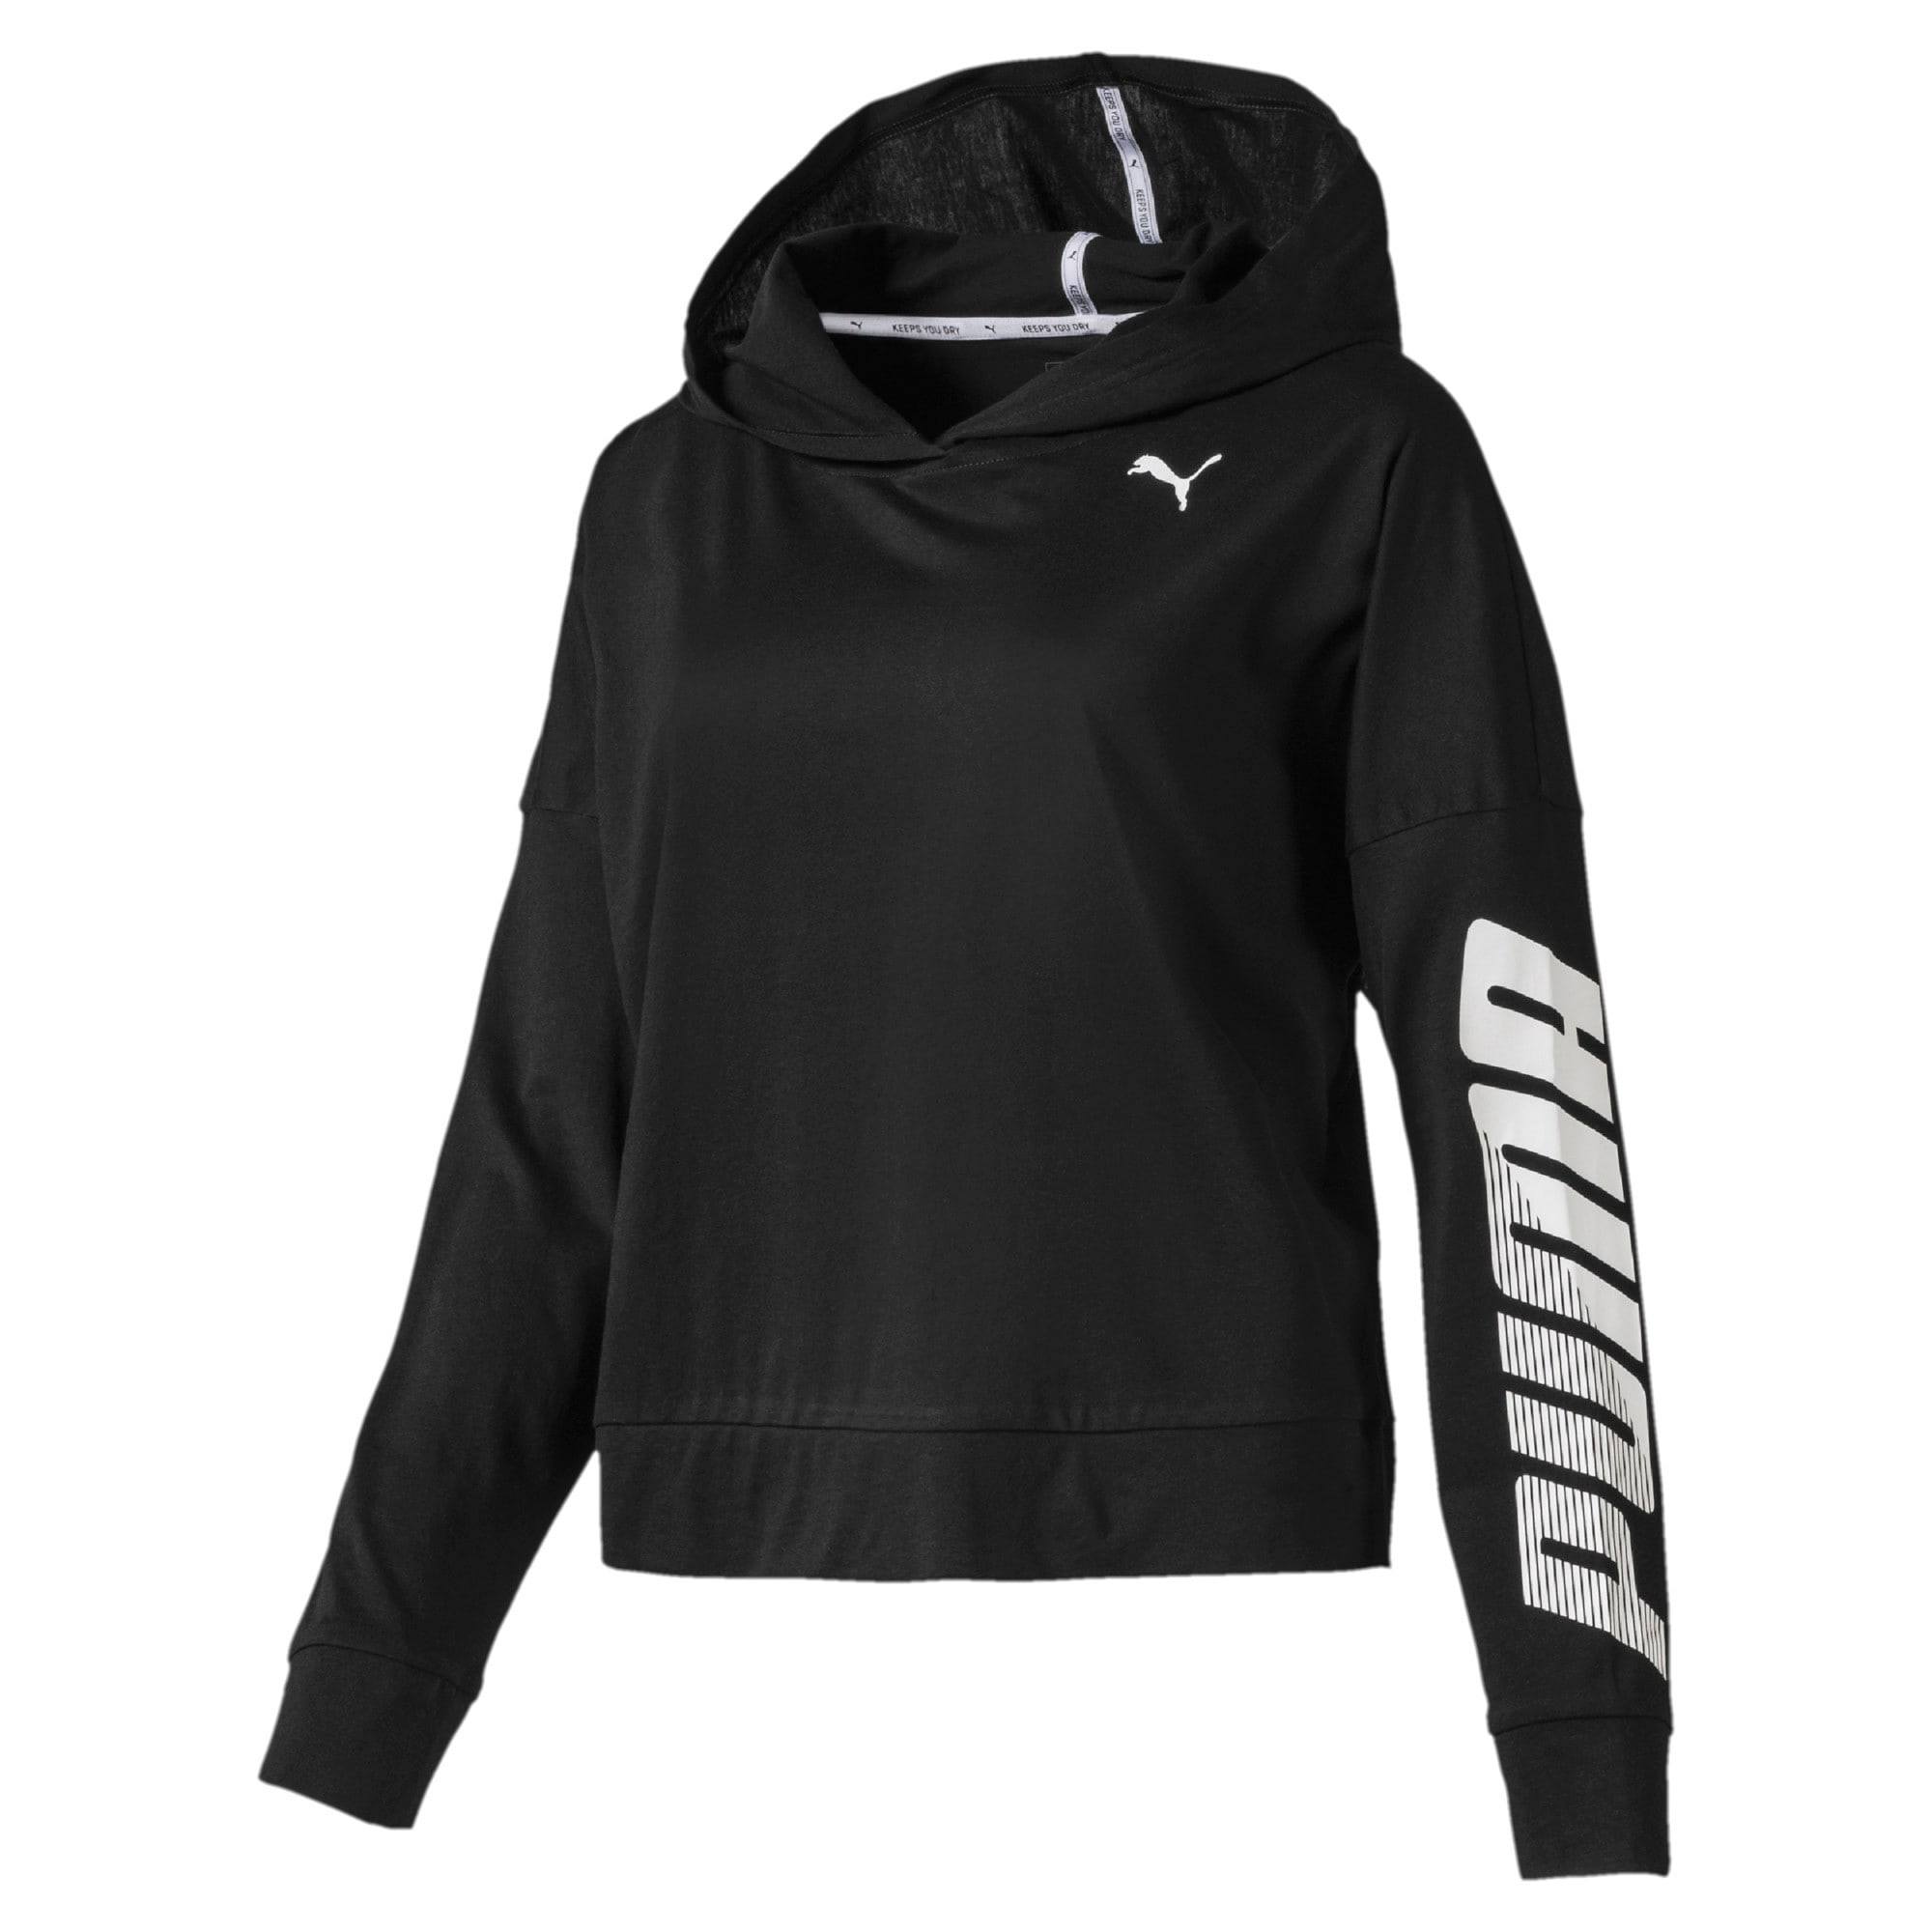 Thumbnail 1 of Modern Sport Long Sleeve Women's Hoodie, Puma Black, medium-IND